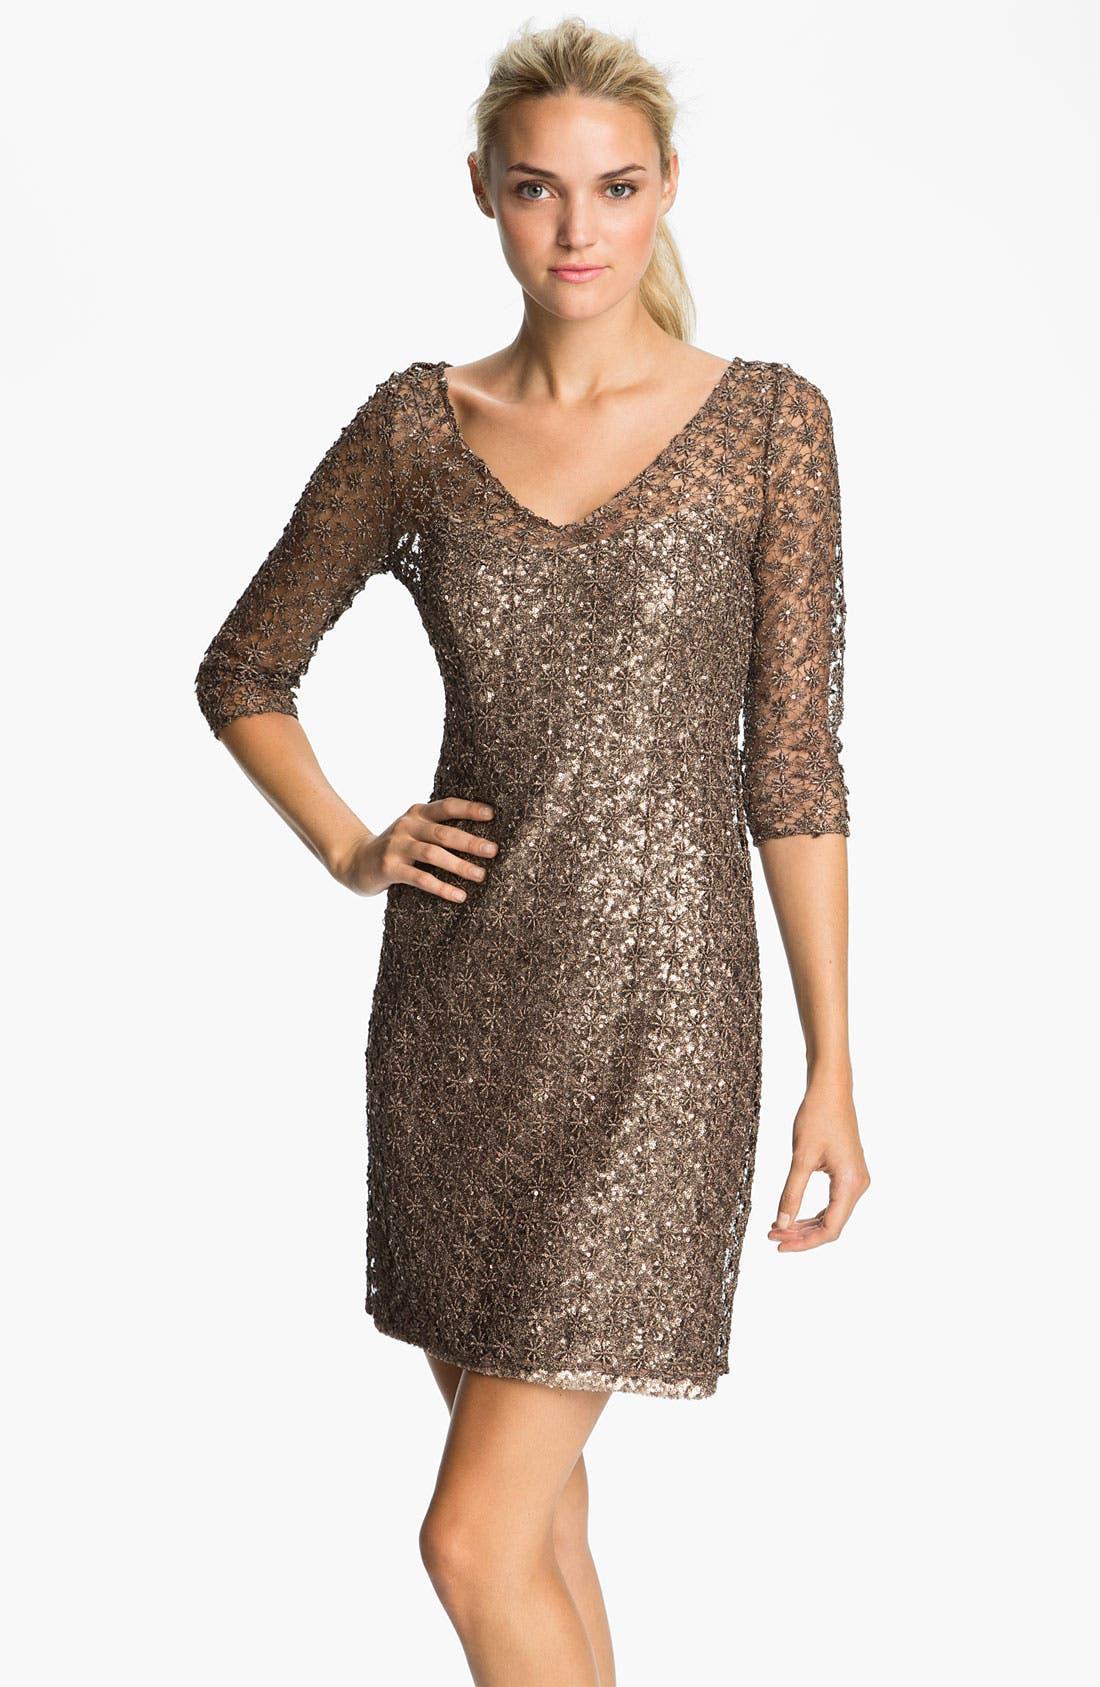 Alternate Image 1 Selected - Kay Unger Double V-Neck Metallic Overlay Dress